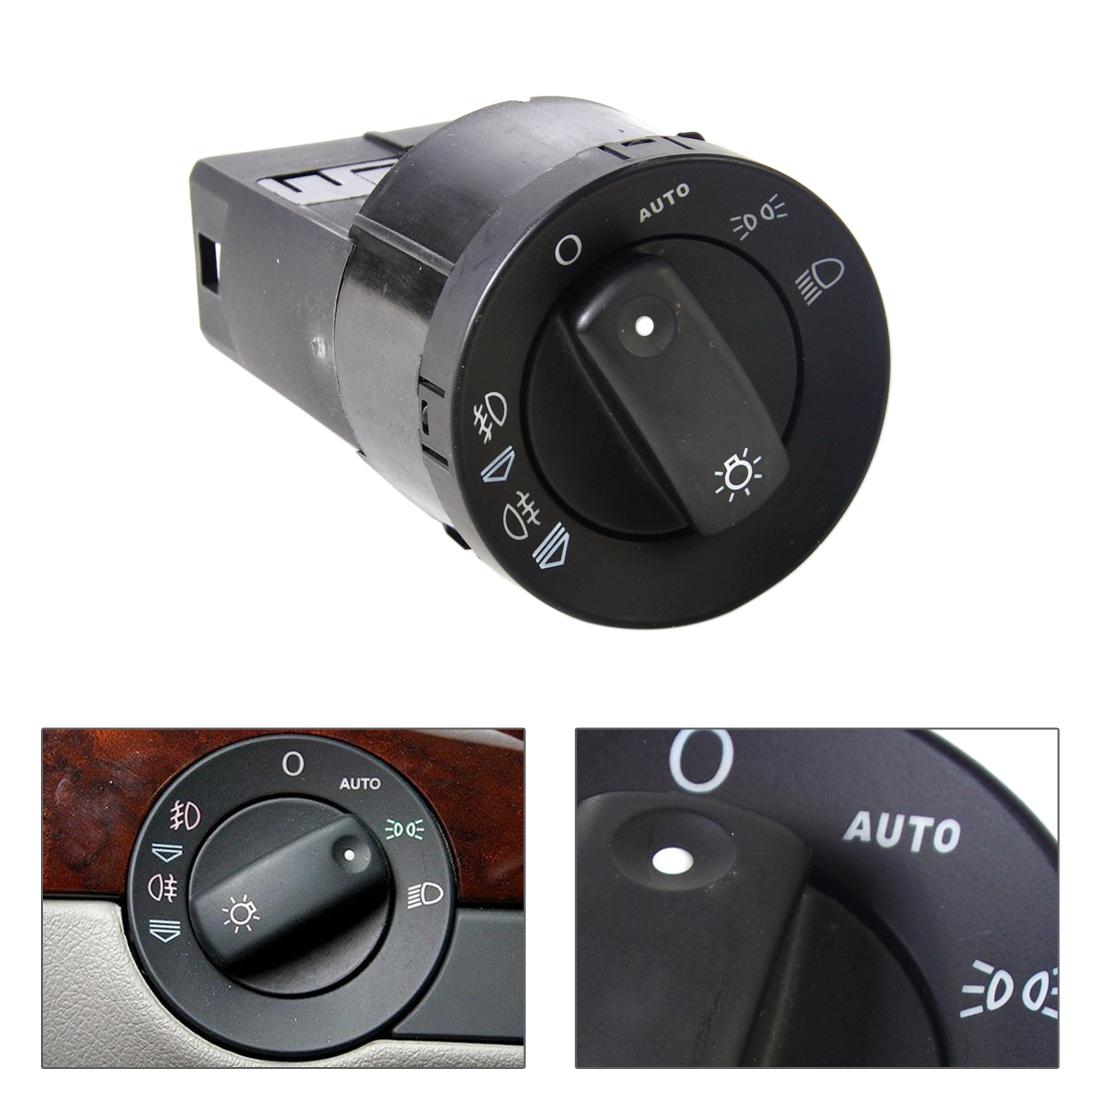 Headlight Fog Light Switch Control Cover Kit For AUDI A4 S4 8E B6 B7 2000-2007